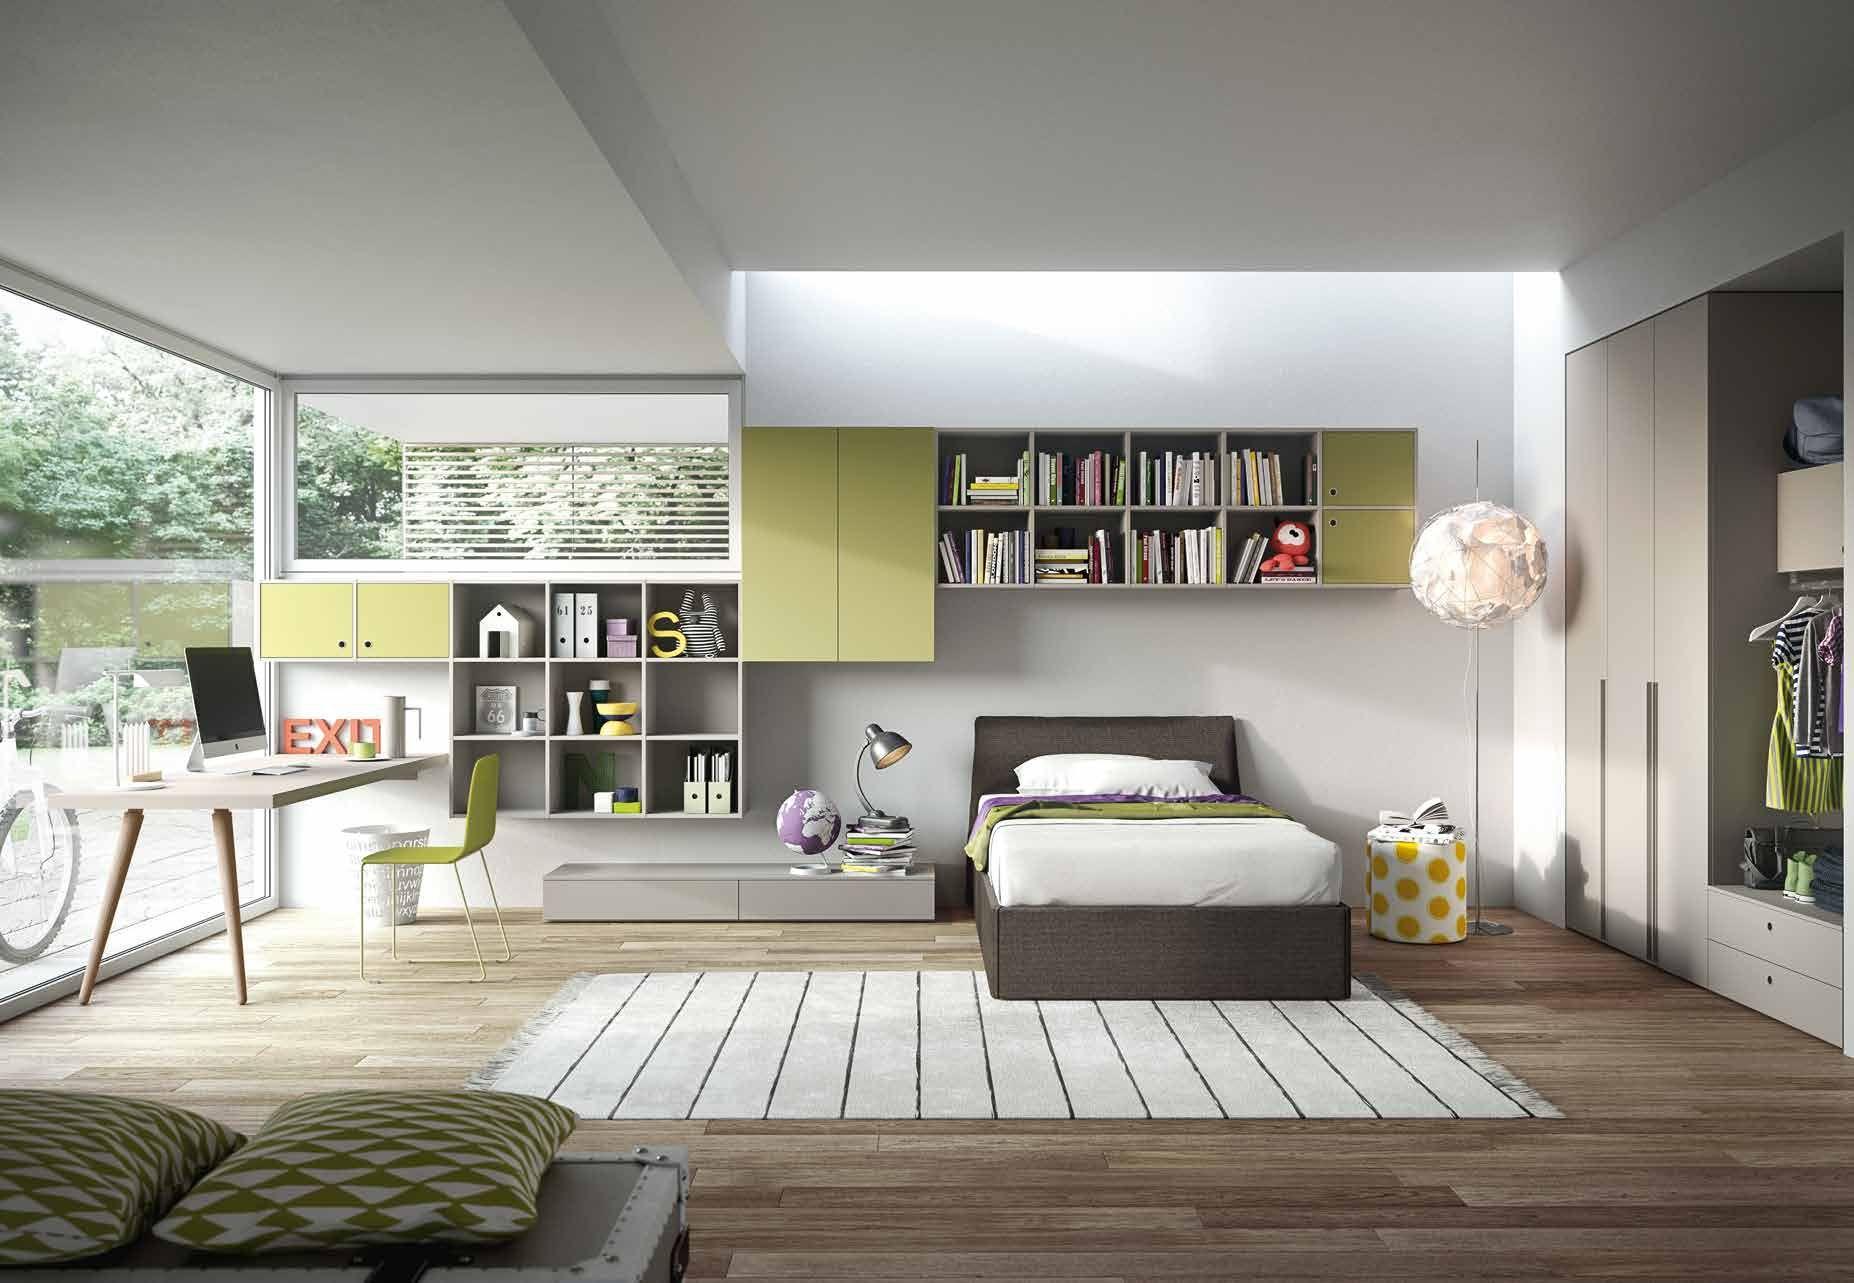 Lima Bedroom Furniture Muebles Pulido Decoracion E Interiorismo Madrid Juvenil Verde